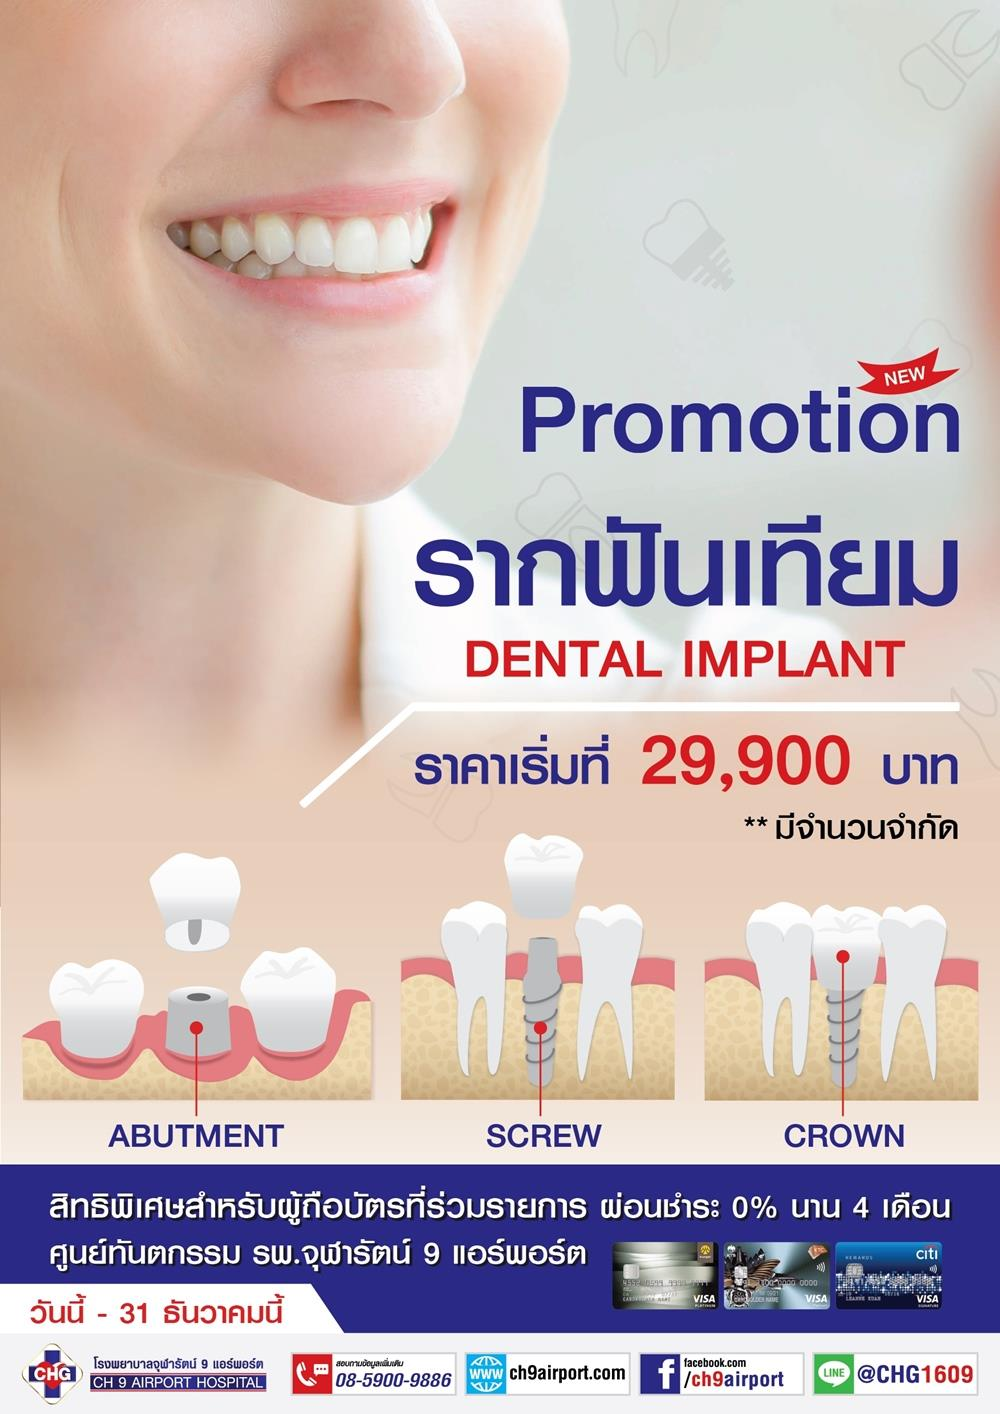 6009-DentalImplant-1